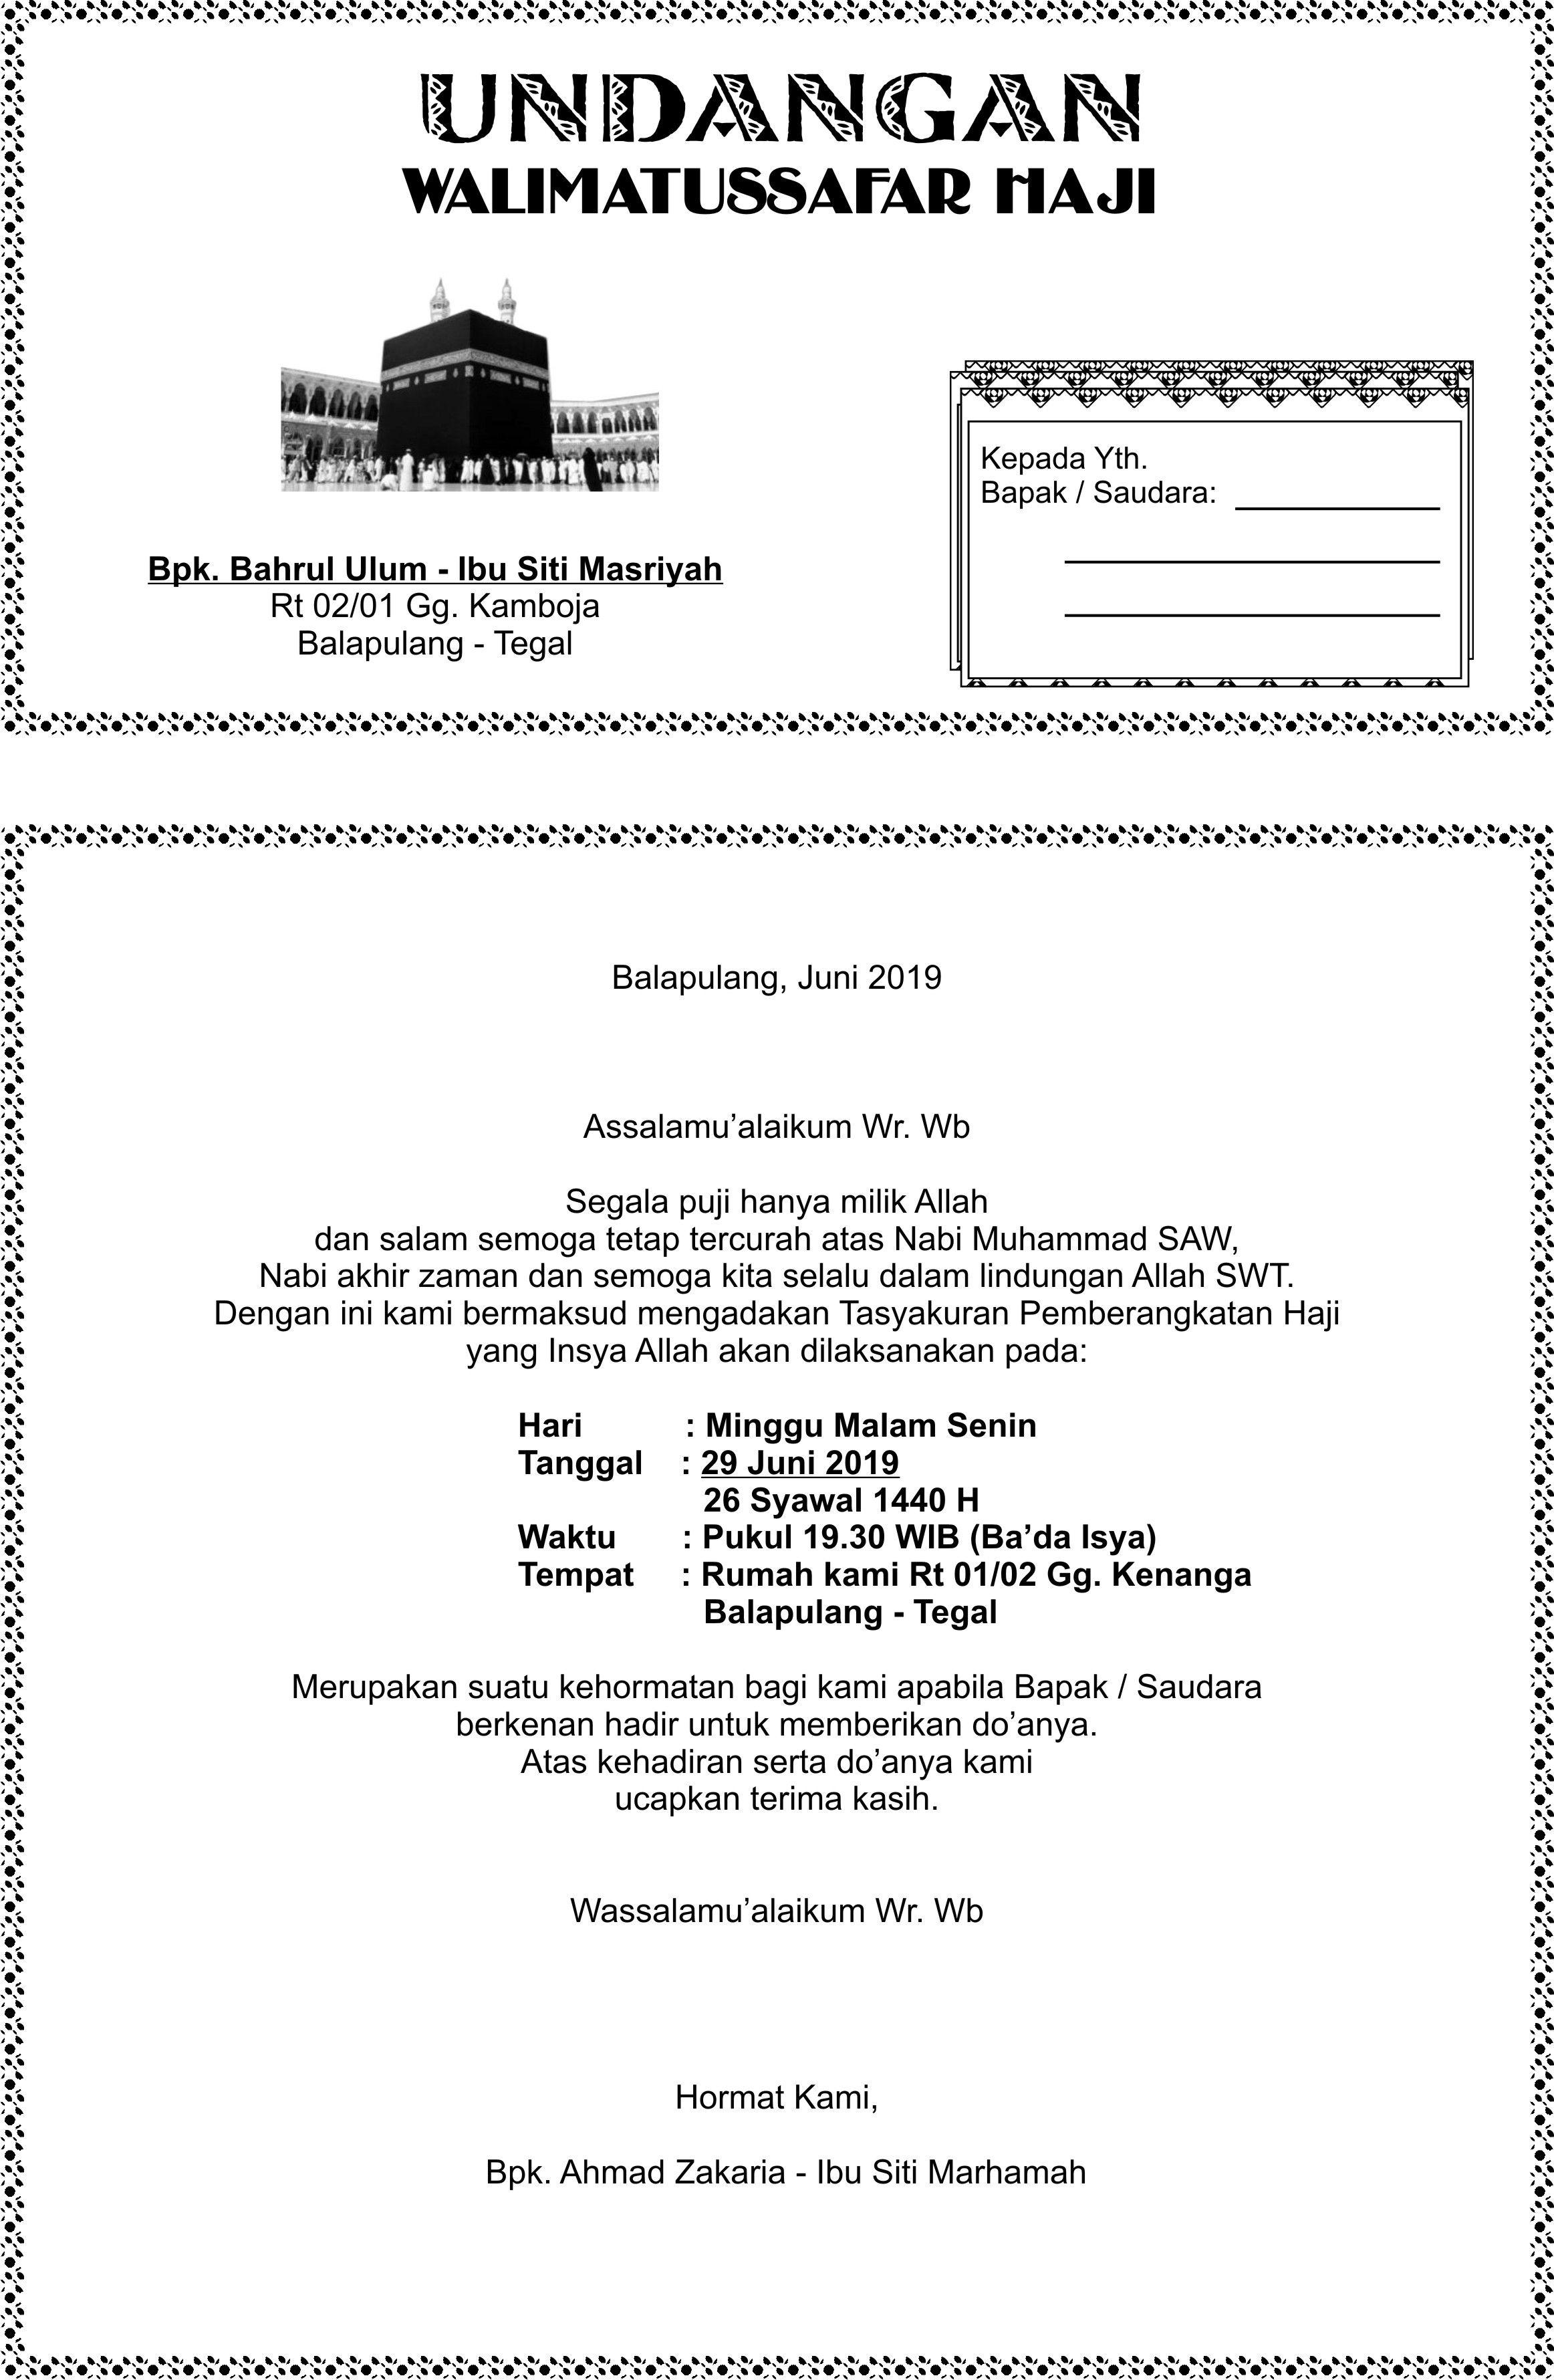 Undangan Walimatussafar Haji Bahrul Ulum Desain Undangan Contoh Undangan Pernikahan Referensi Desain